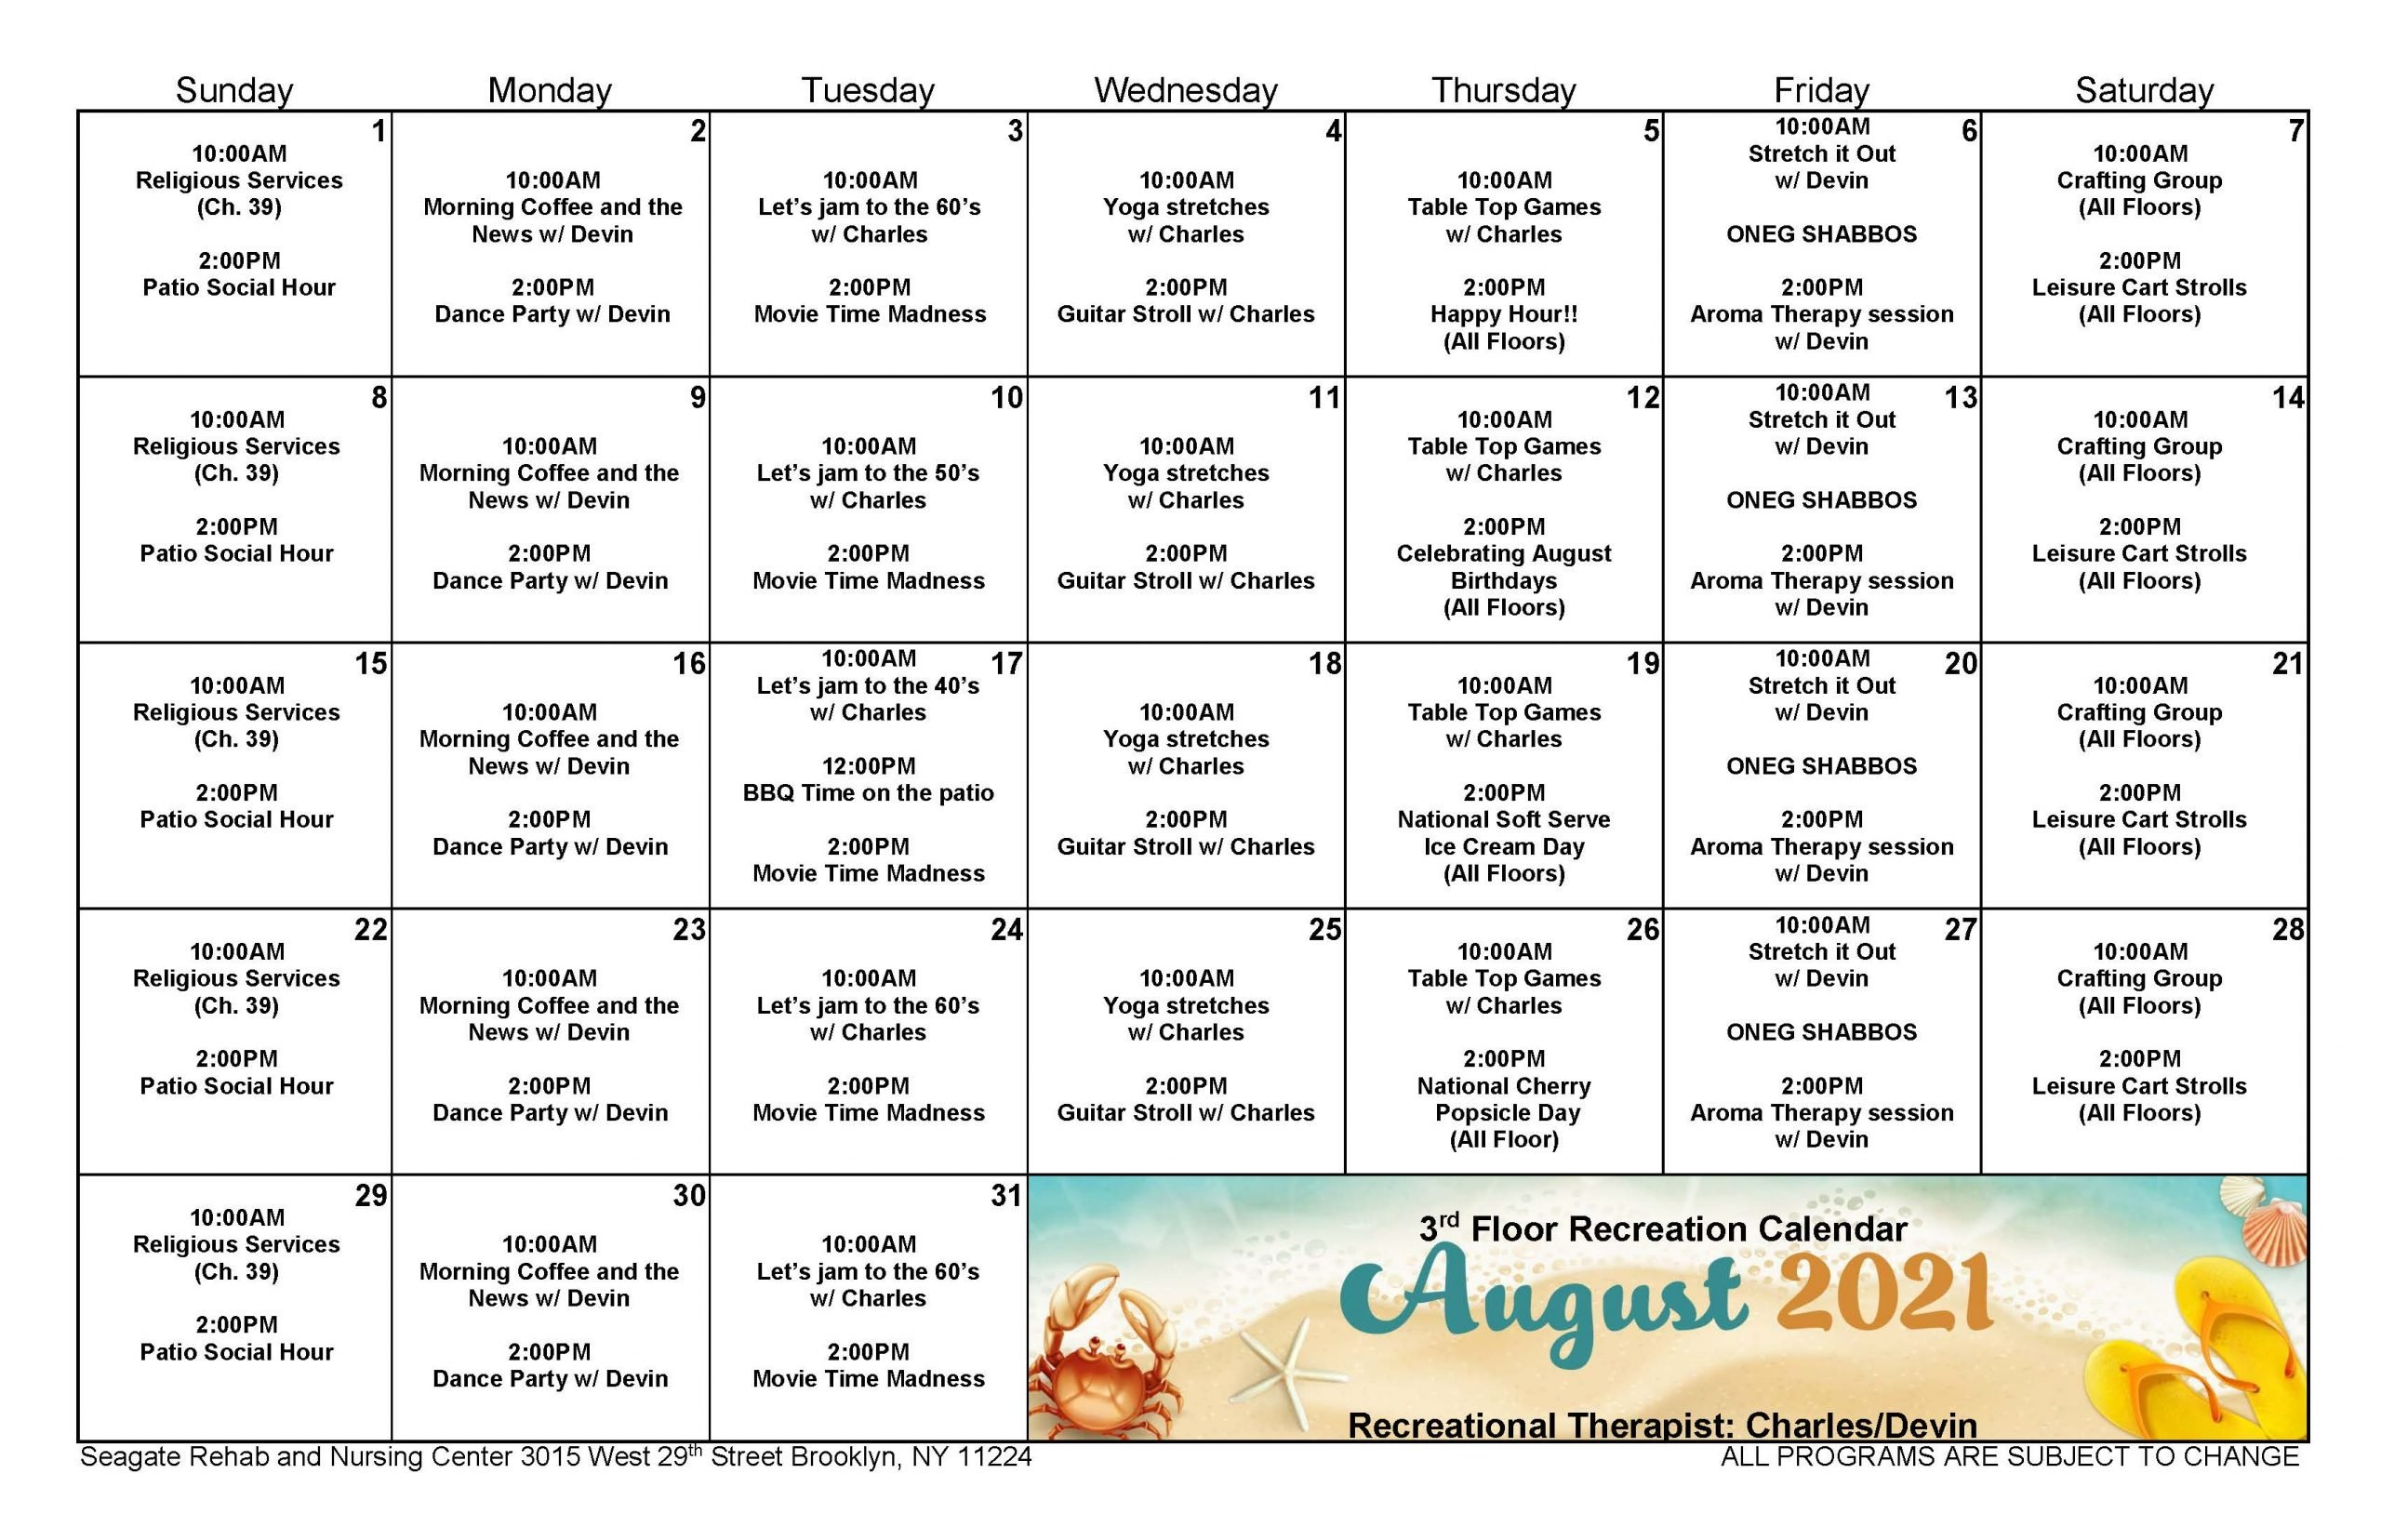 Seagate August Event Calendar for 3rd Floor